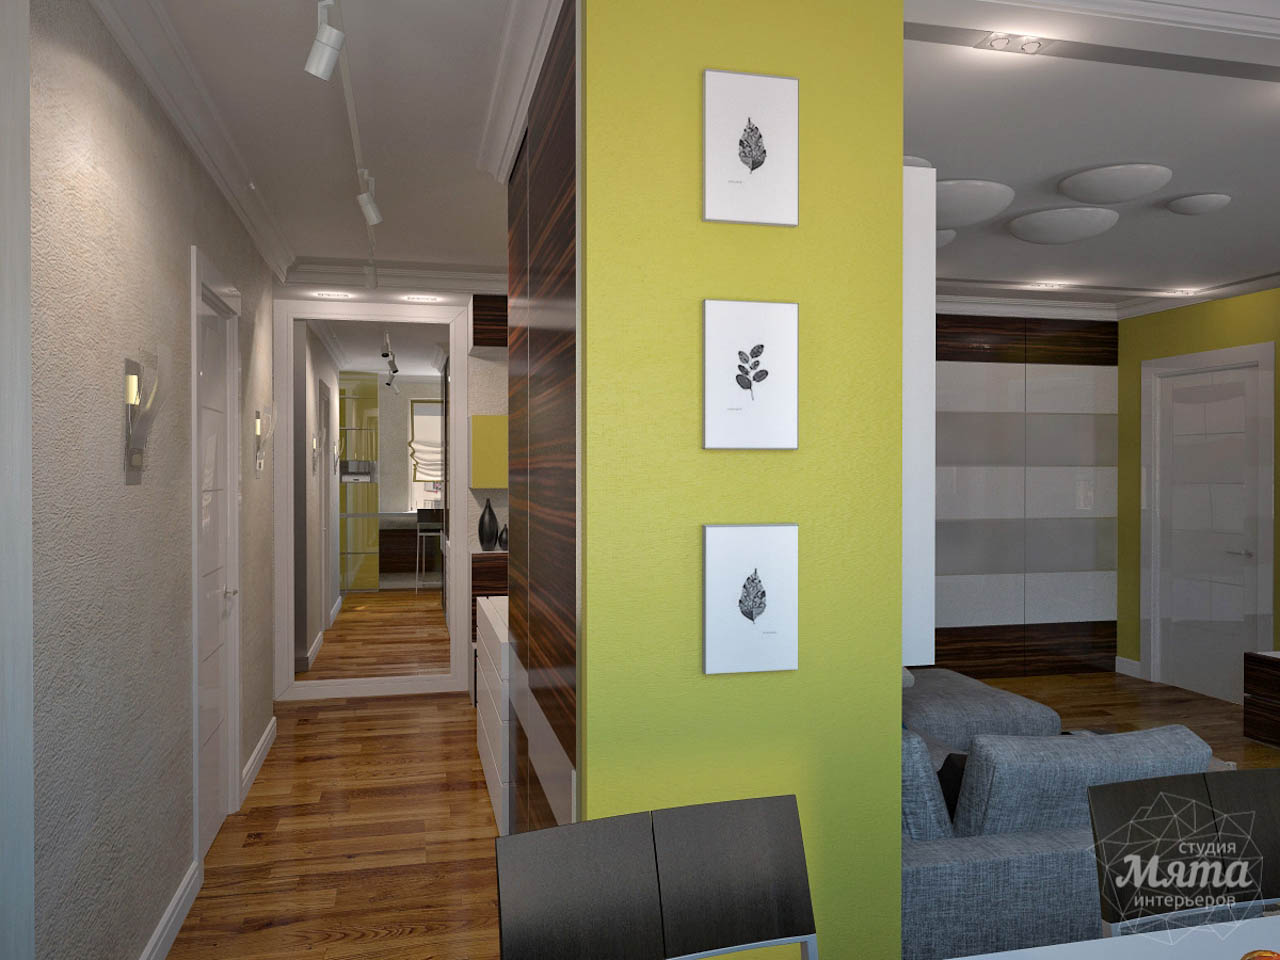 Дизайн интерьера двухкомнатной квартиры по ул. Комсомольская 14 img191546566